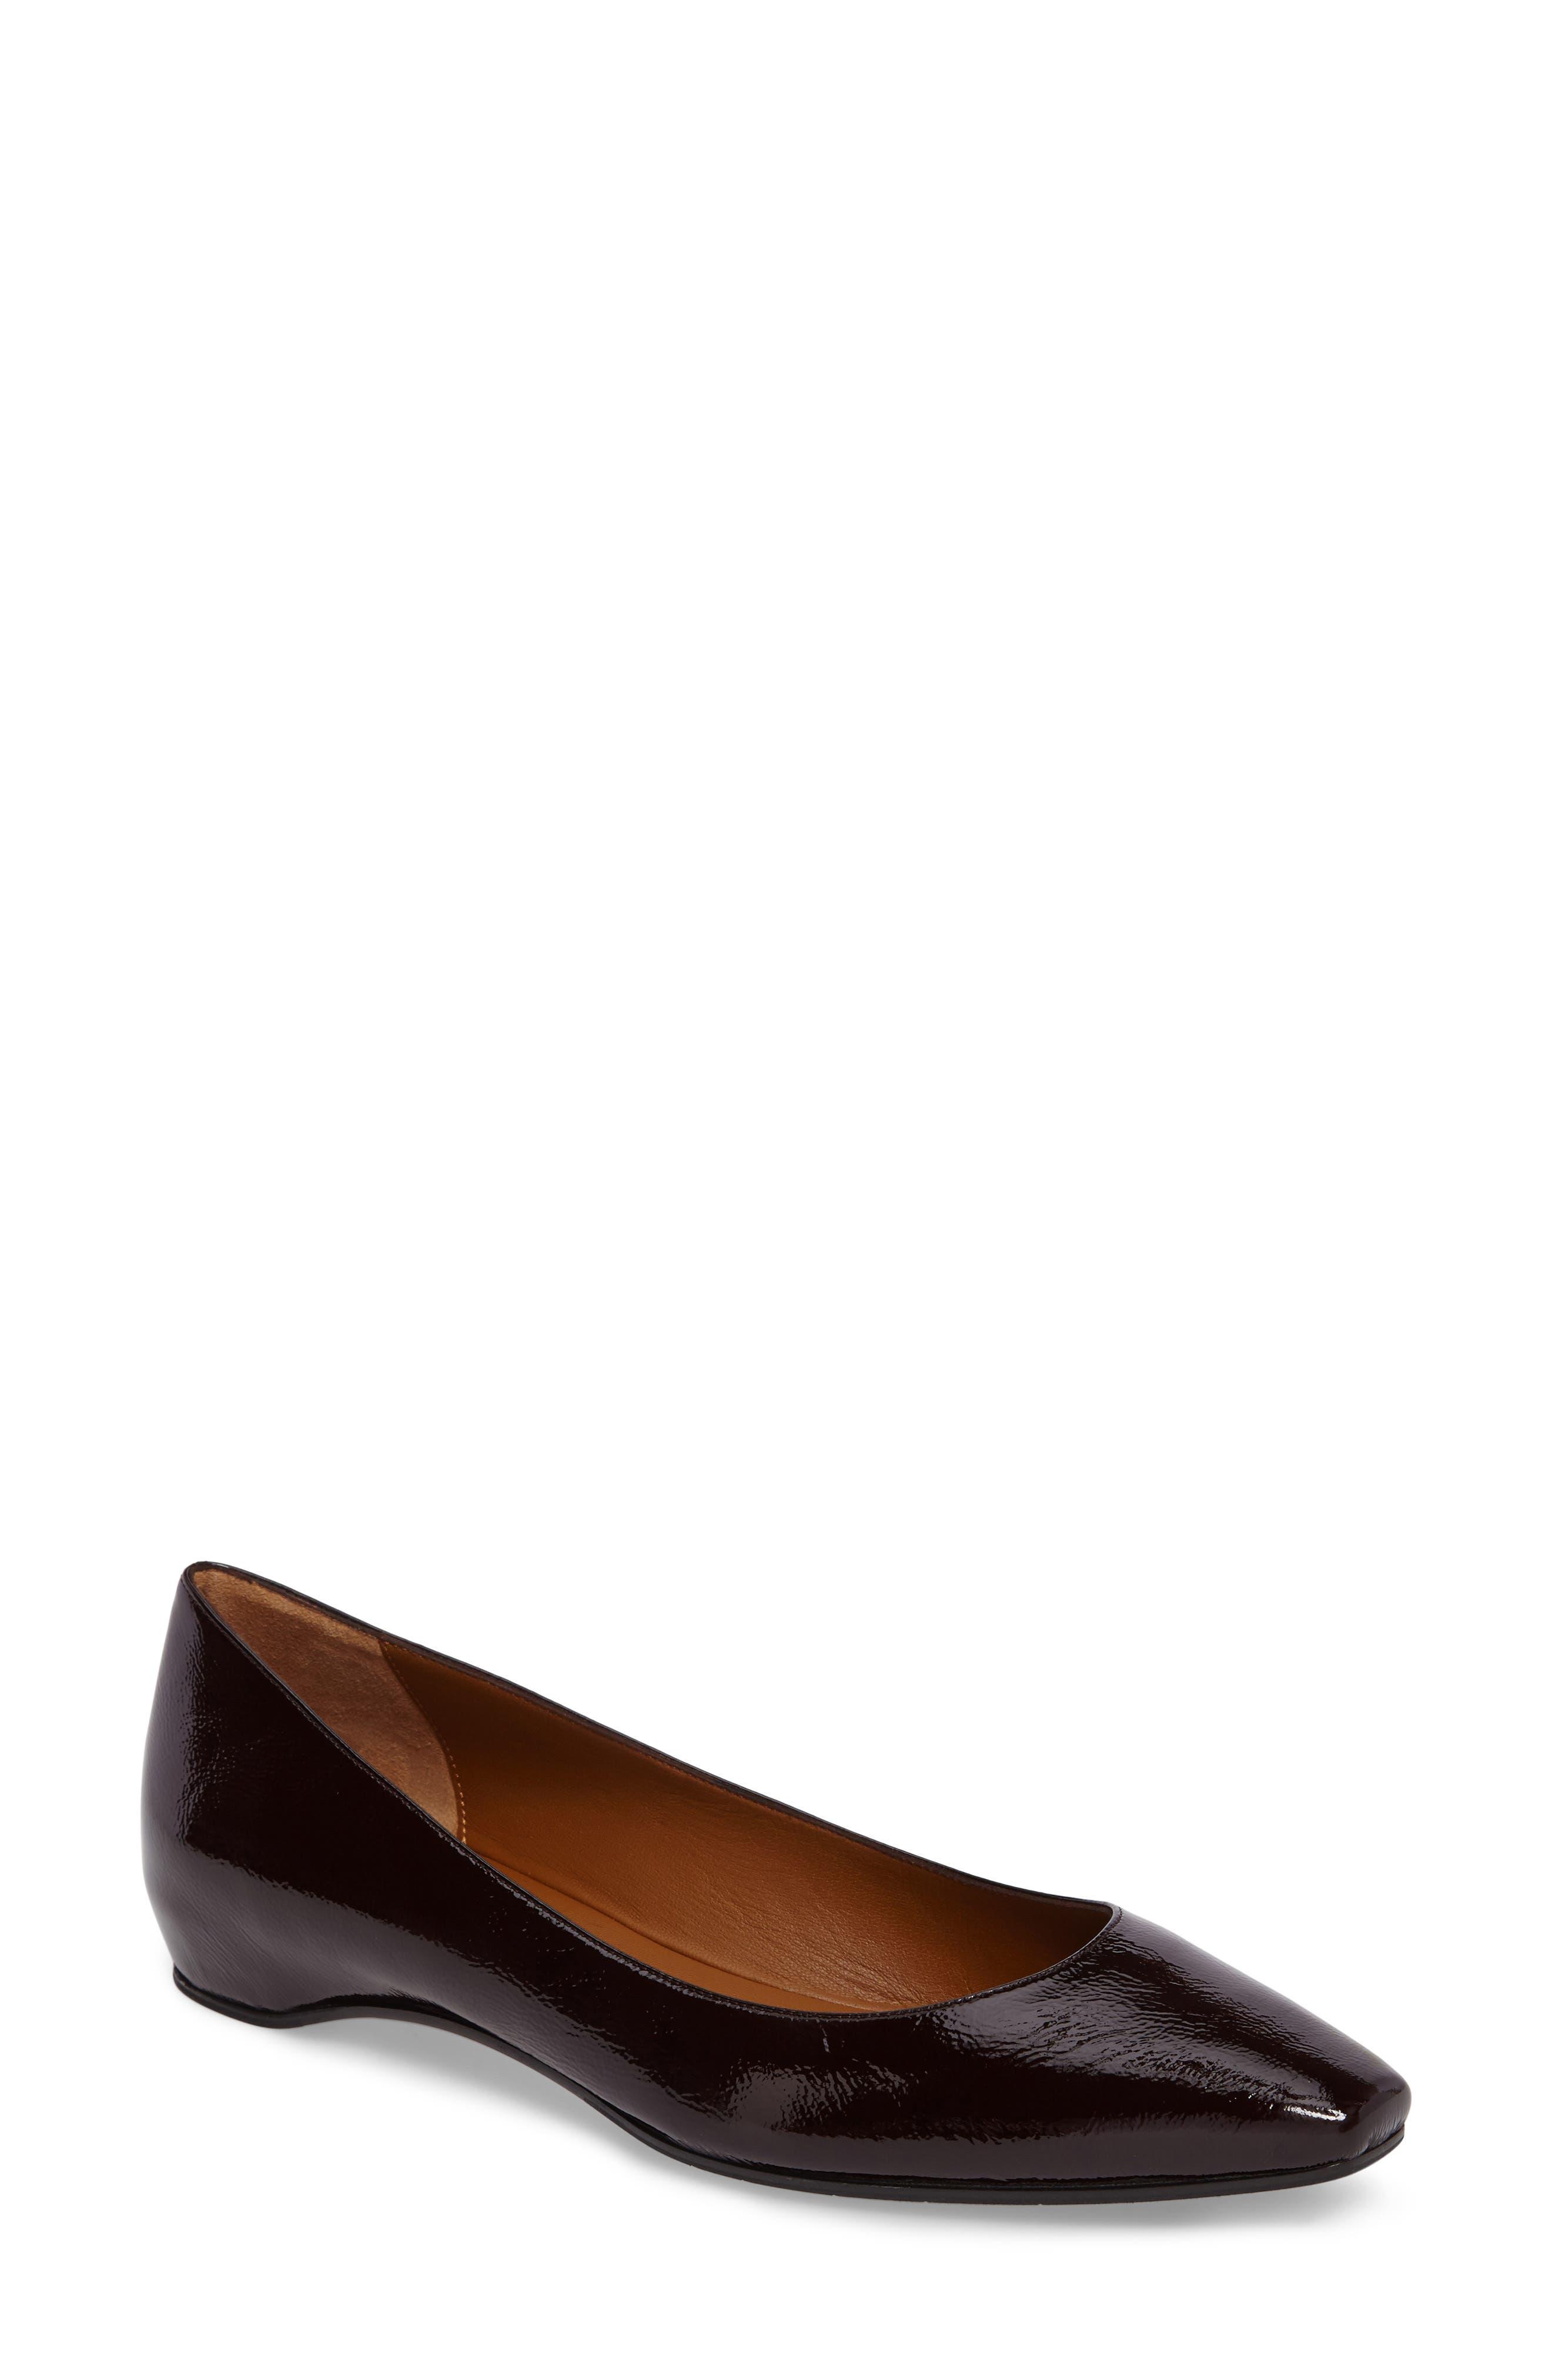 Marcella Weatherproof Leather Flat,                         Main,                         color, Wine